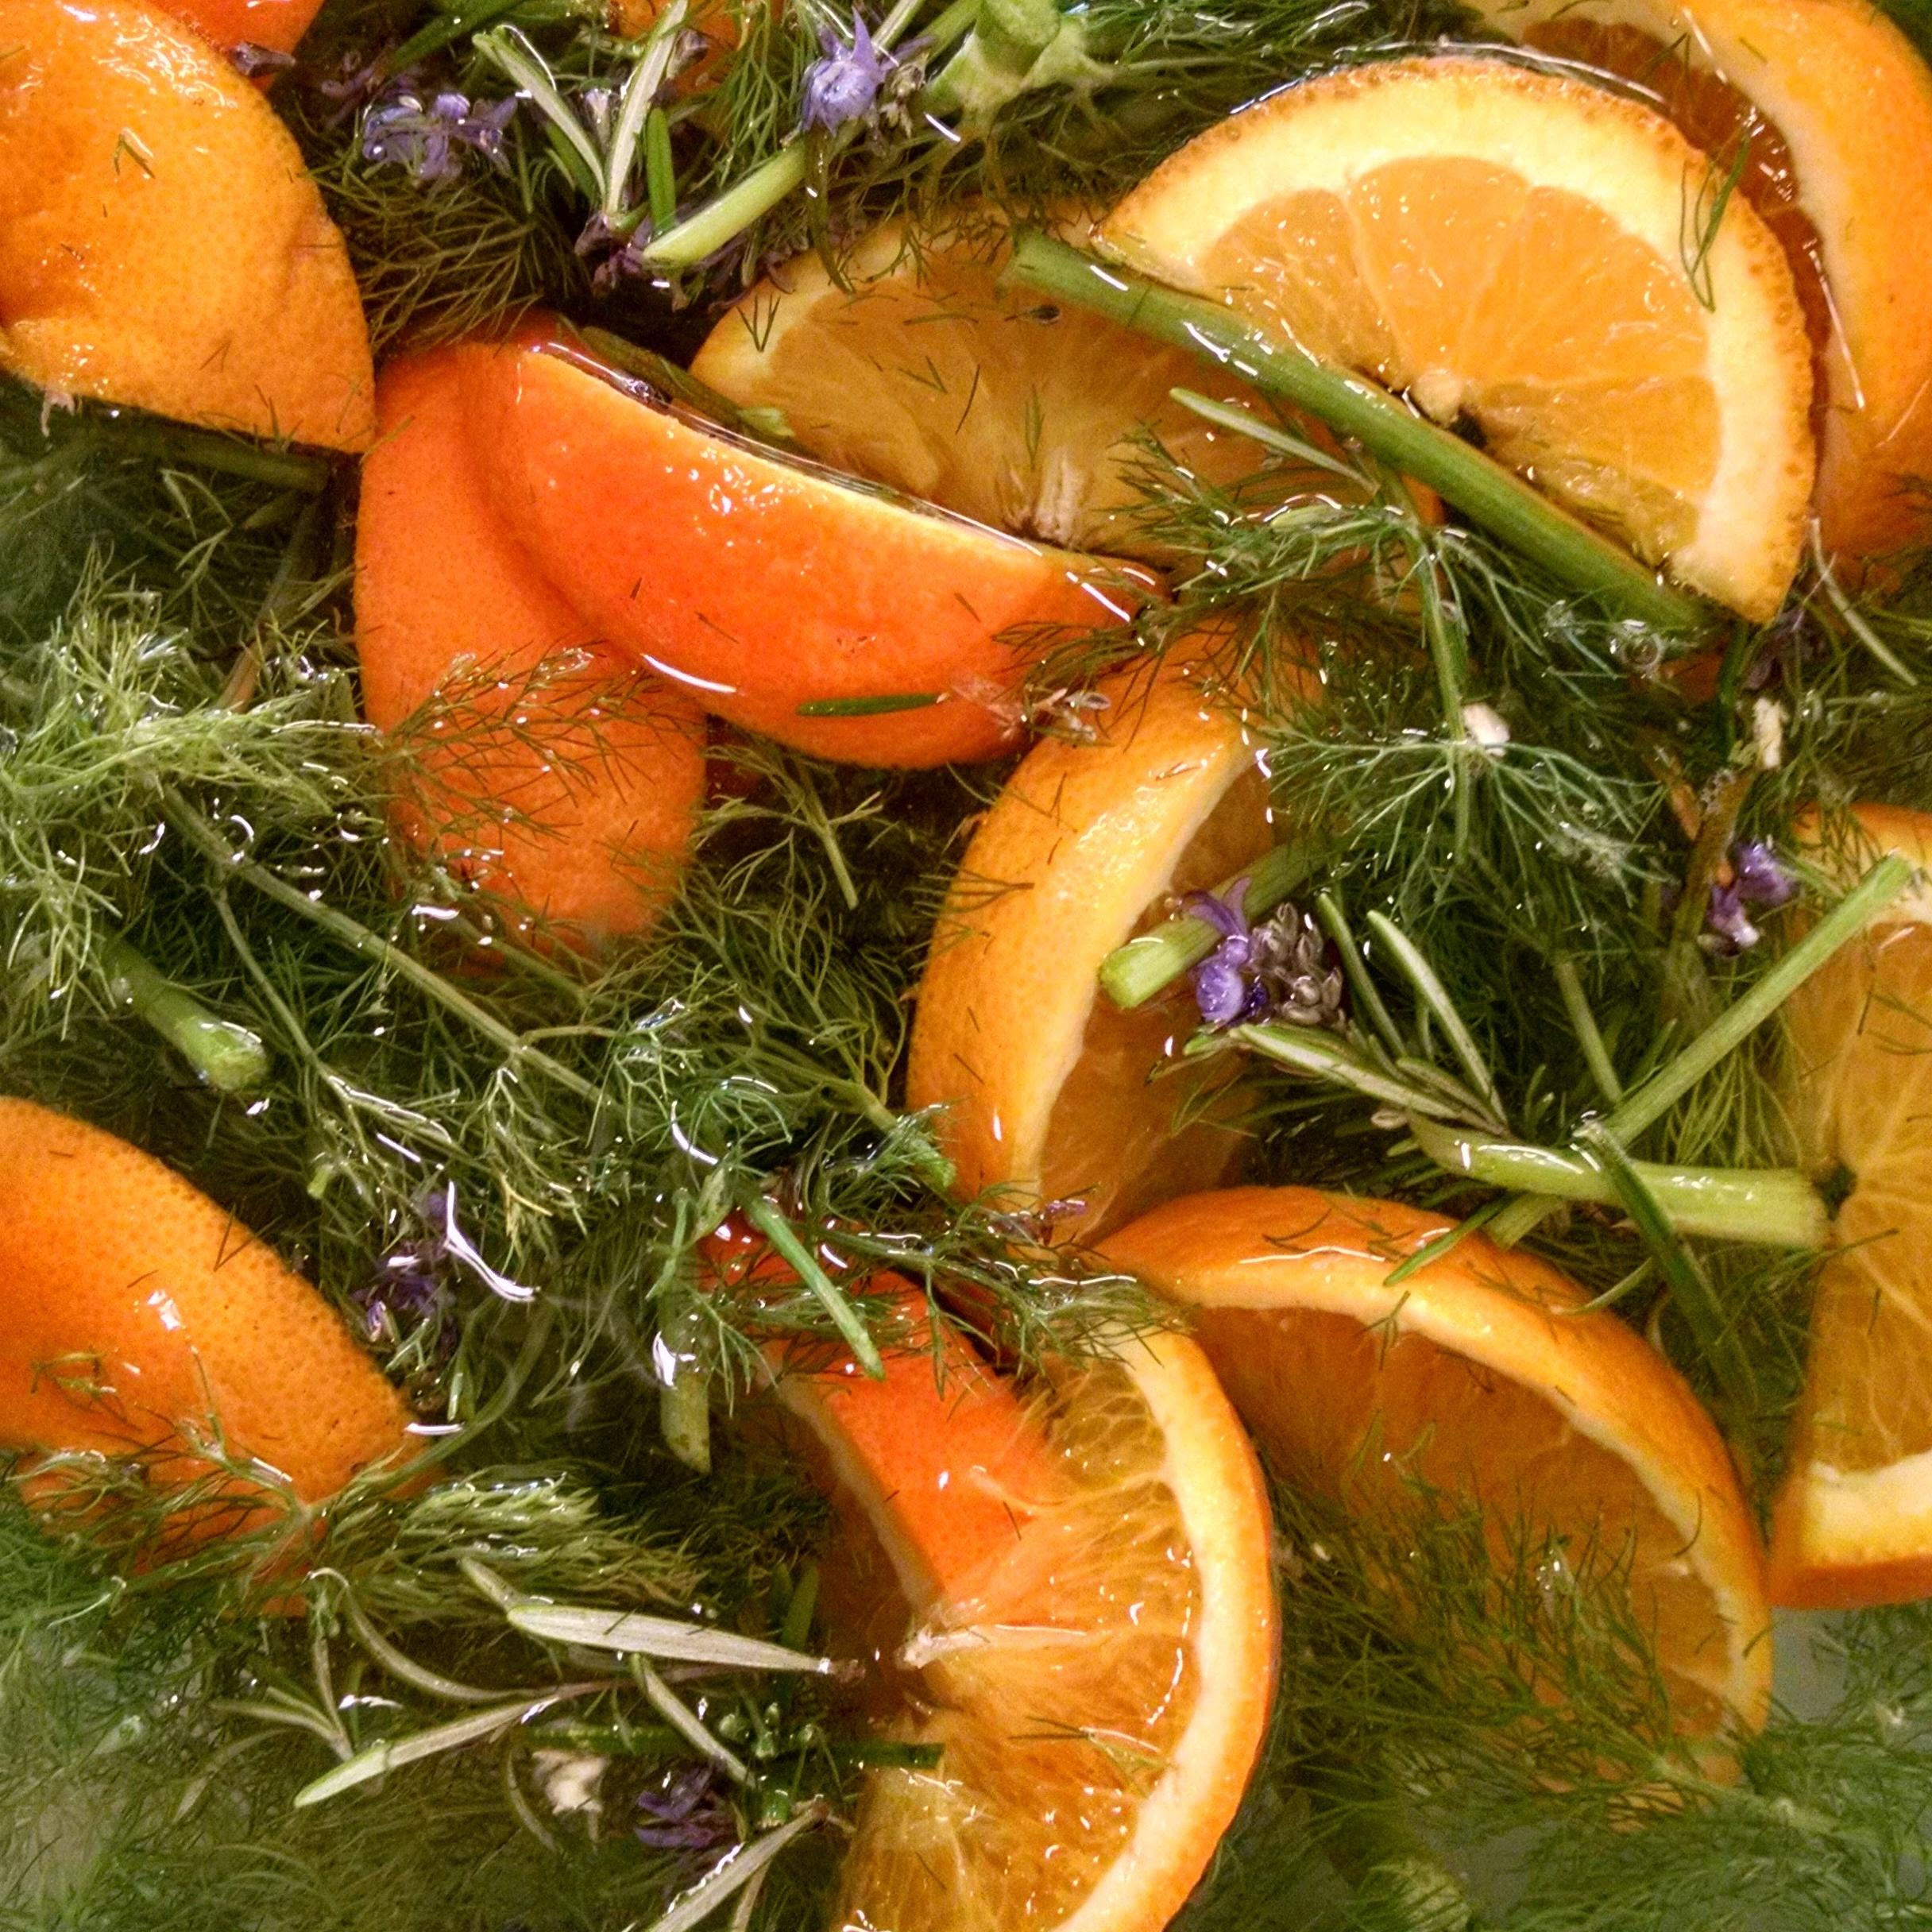 Orange Fennel Rosemary infused water